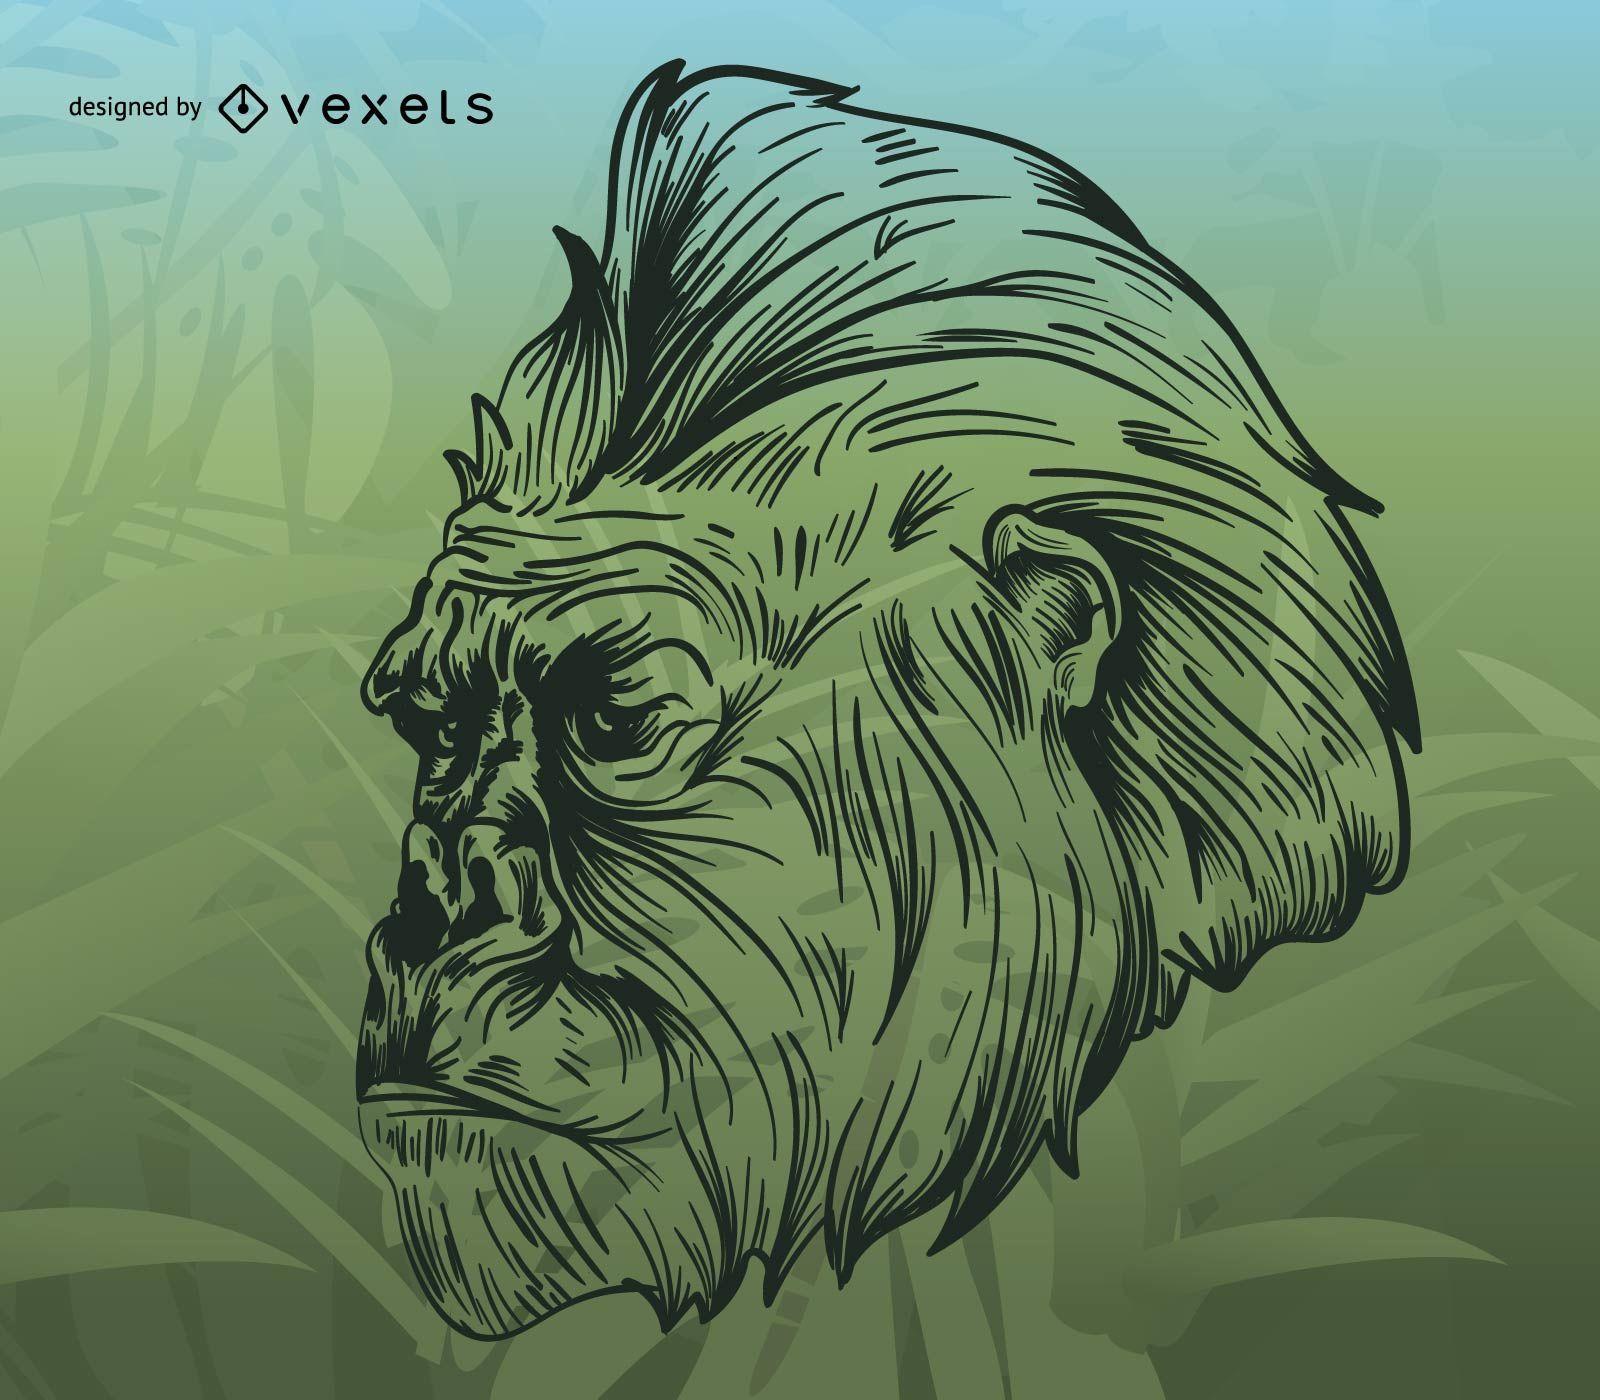 Gorilla illustration over tropical background